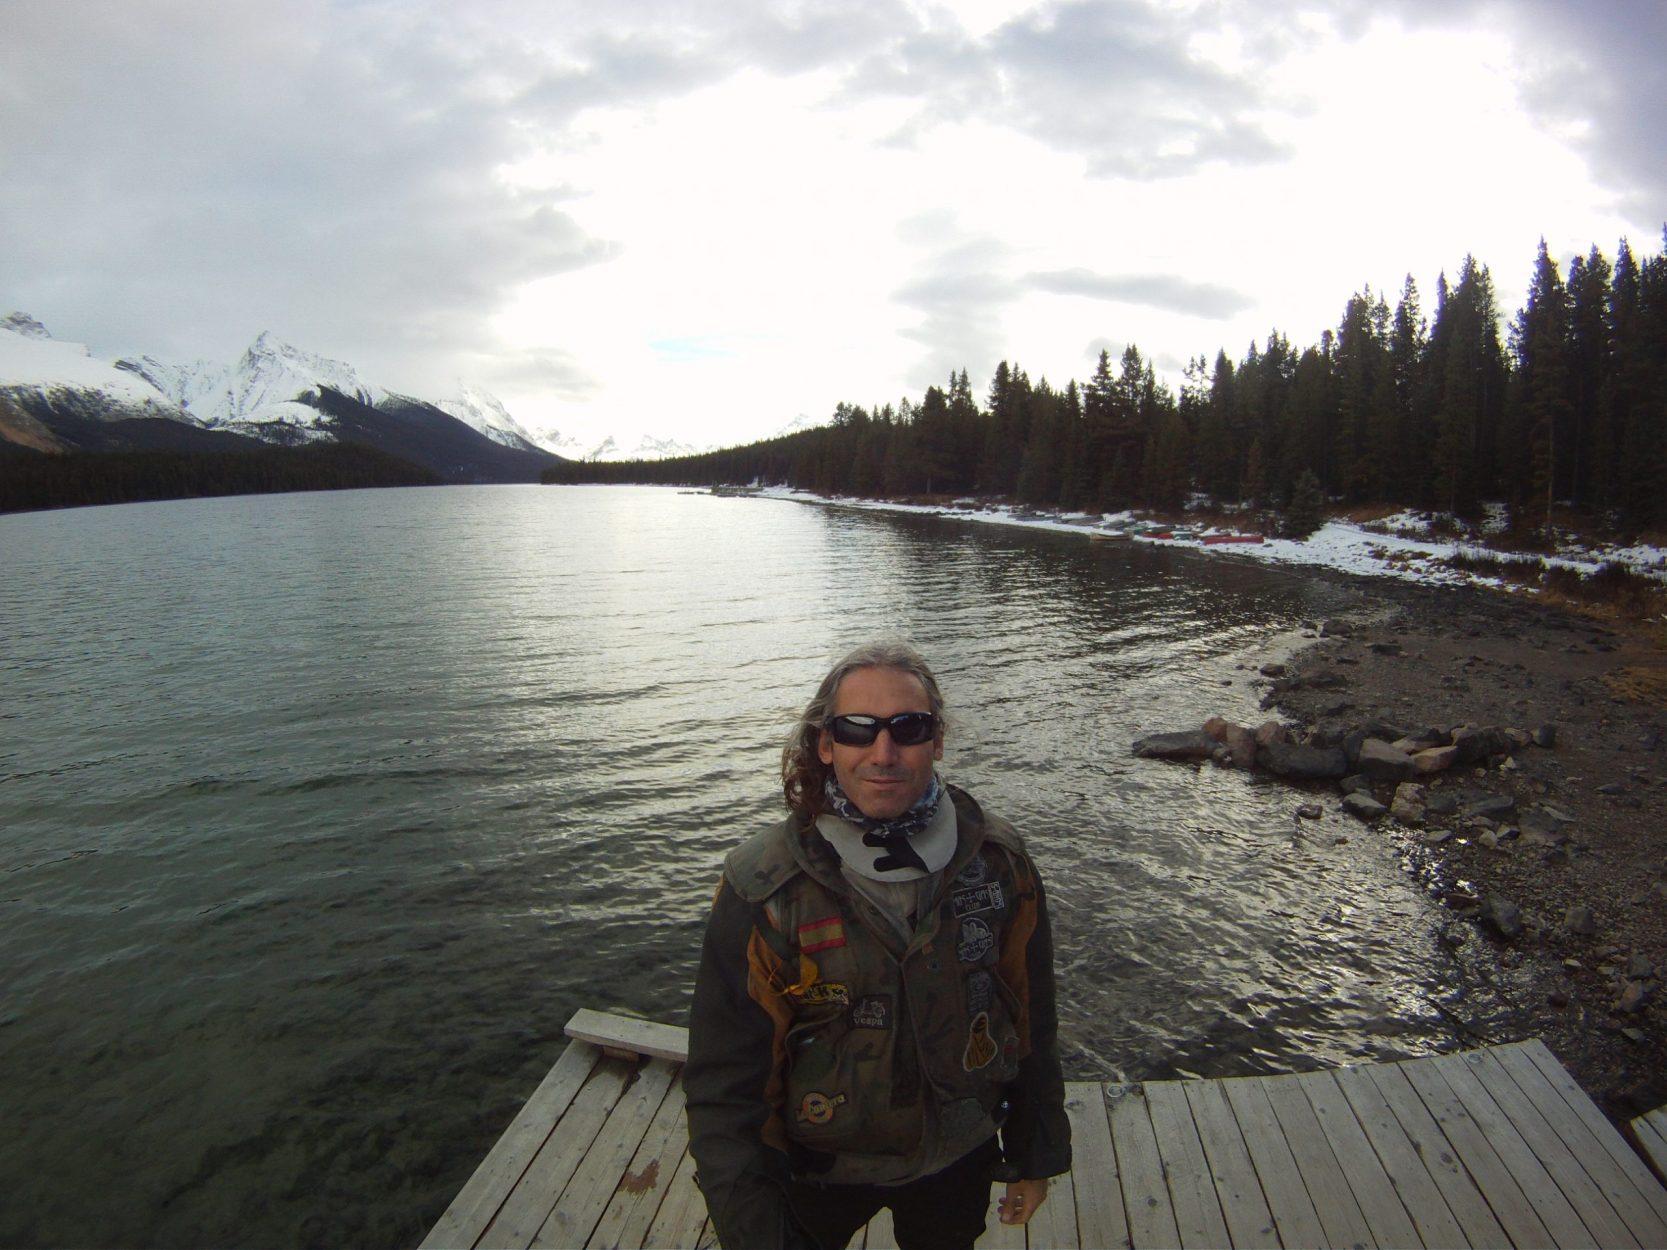 JASPER, Parque Nacional En Canadá – 27 Oct 2016